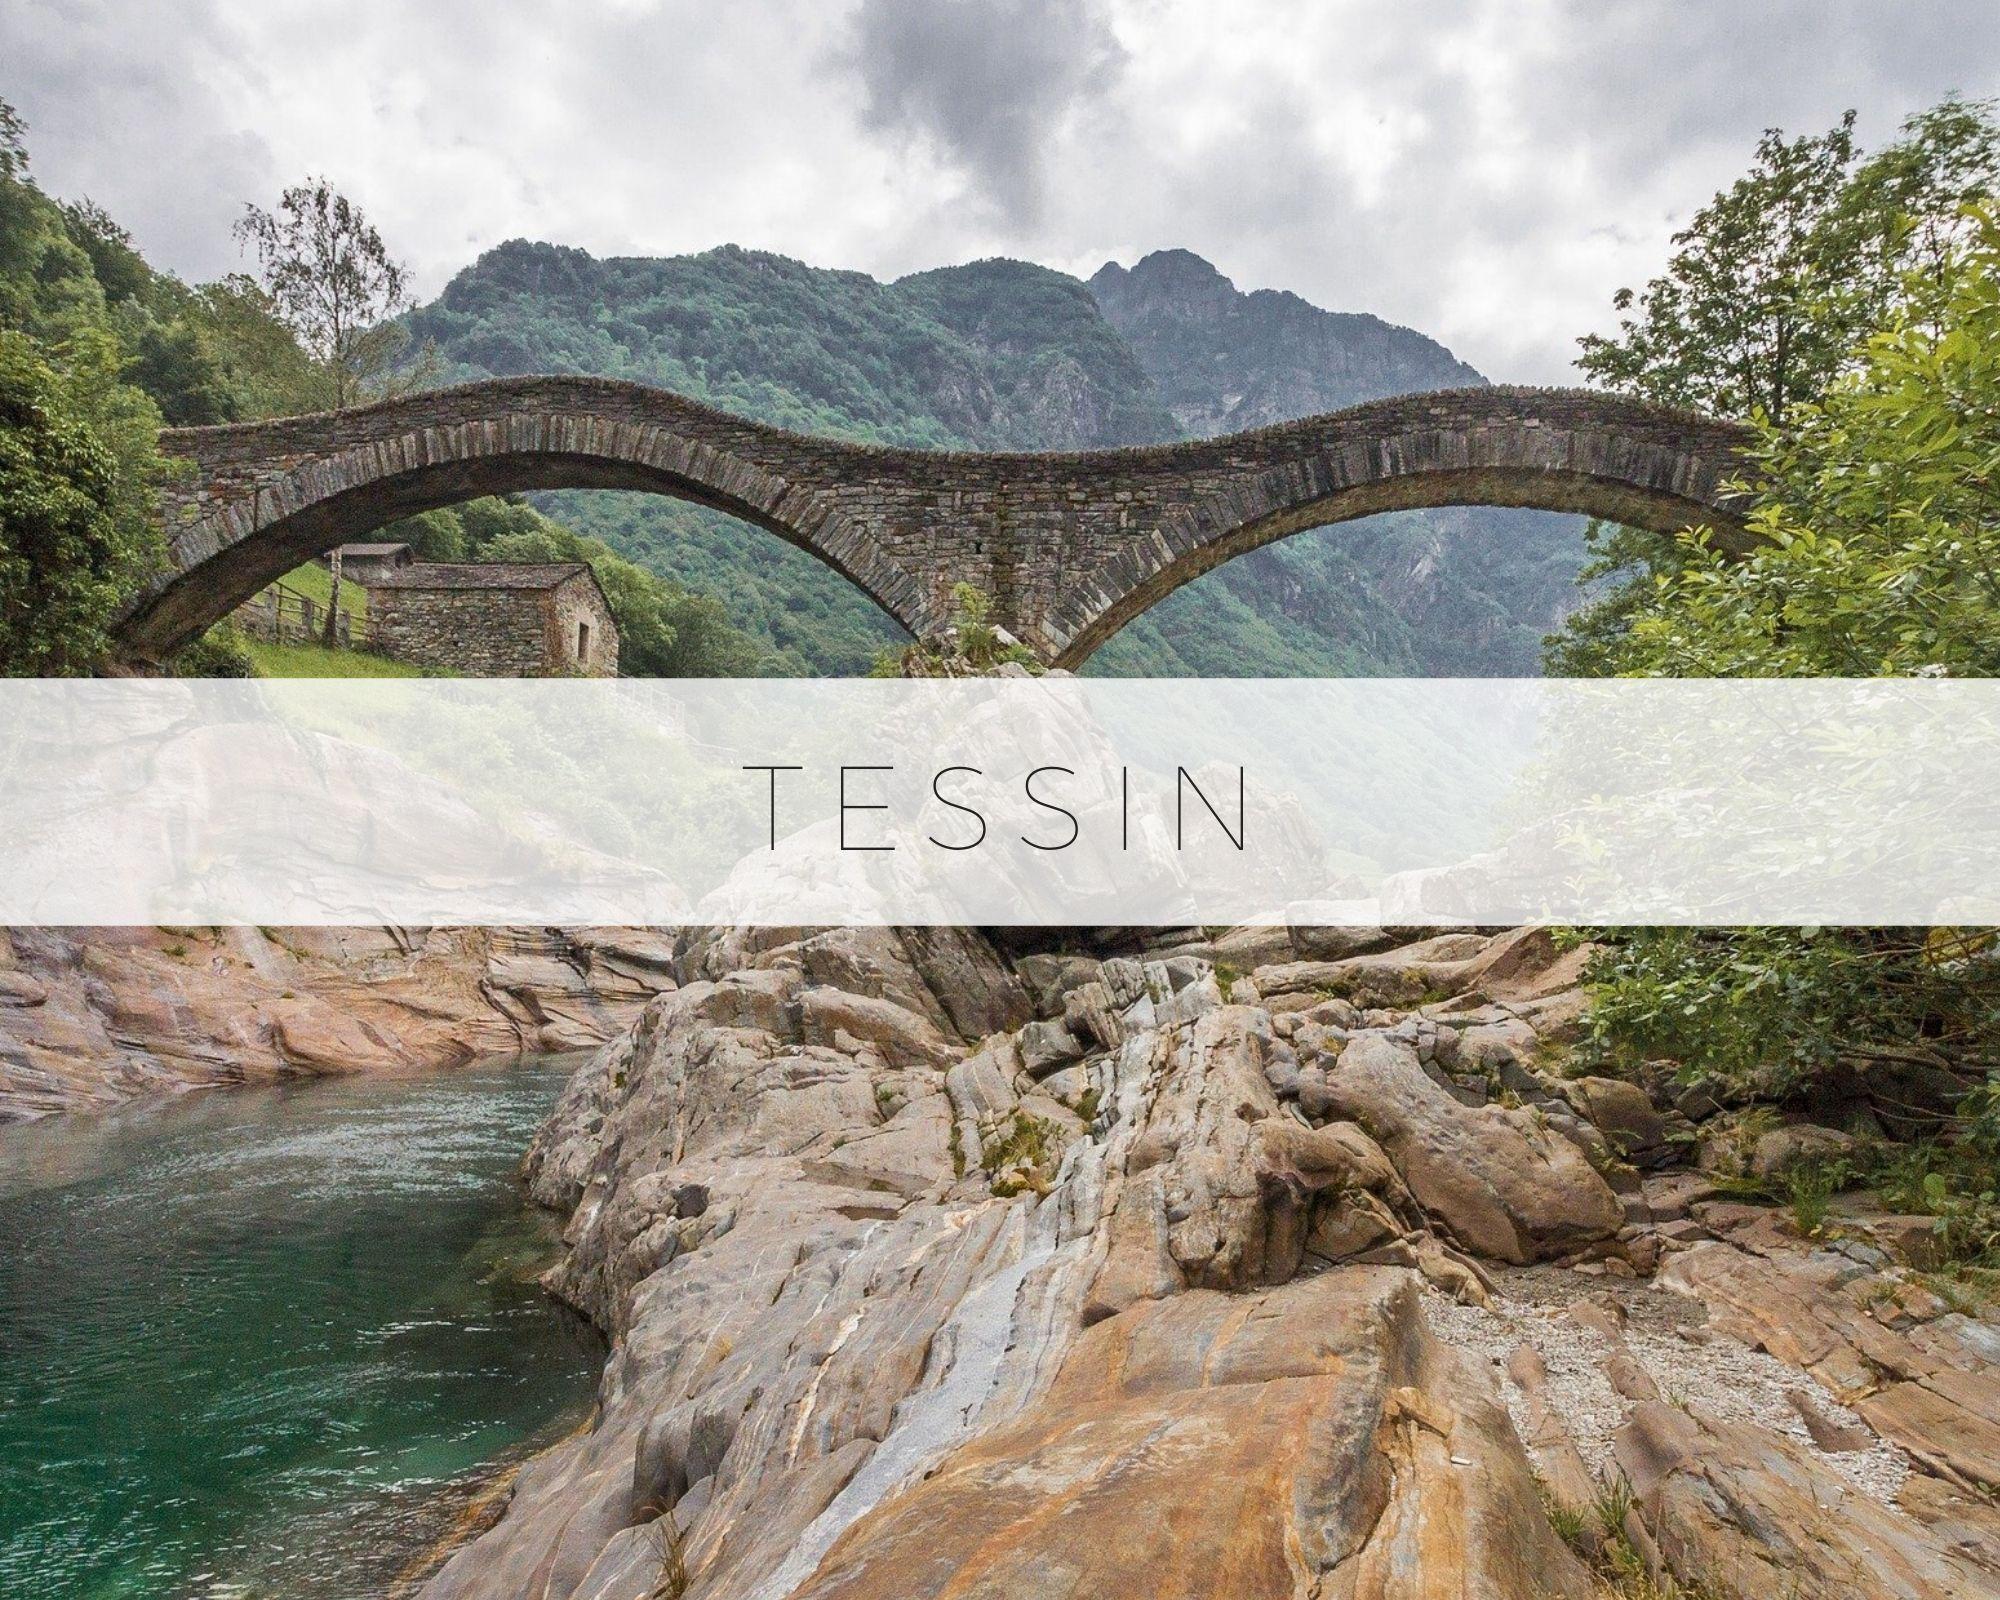 Tessin Lugano Locarno Suisse Canton Visite Endroit Lieu Voyage